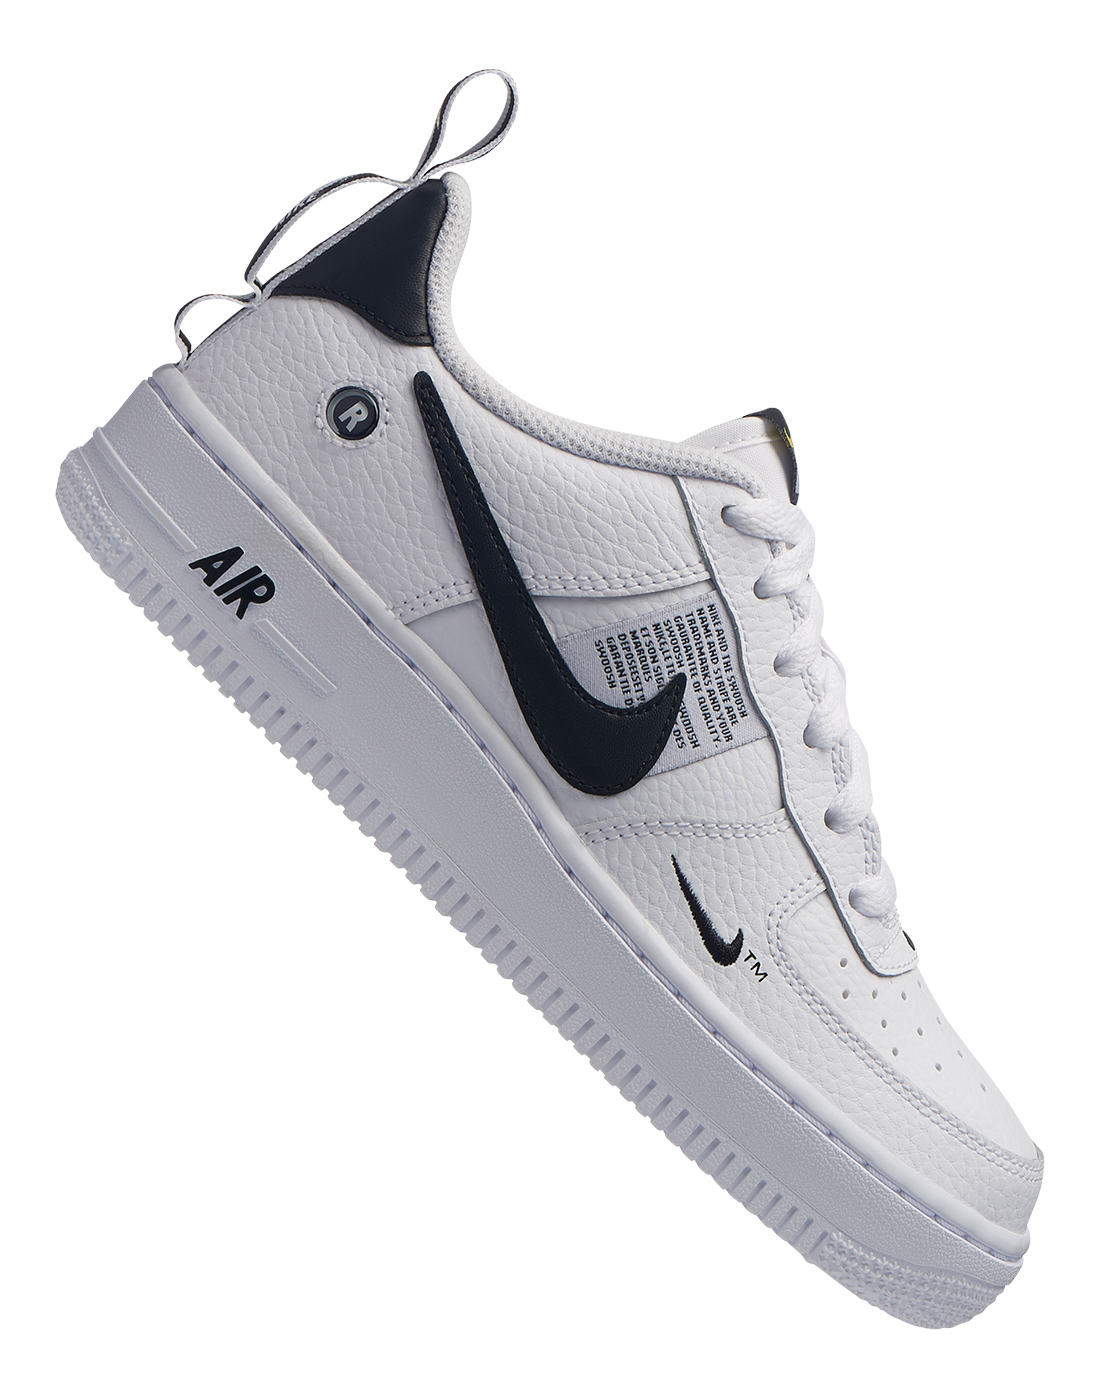 Boy's White & Black Nike Air Force 1 | Life Style Sports